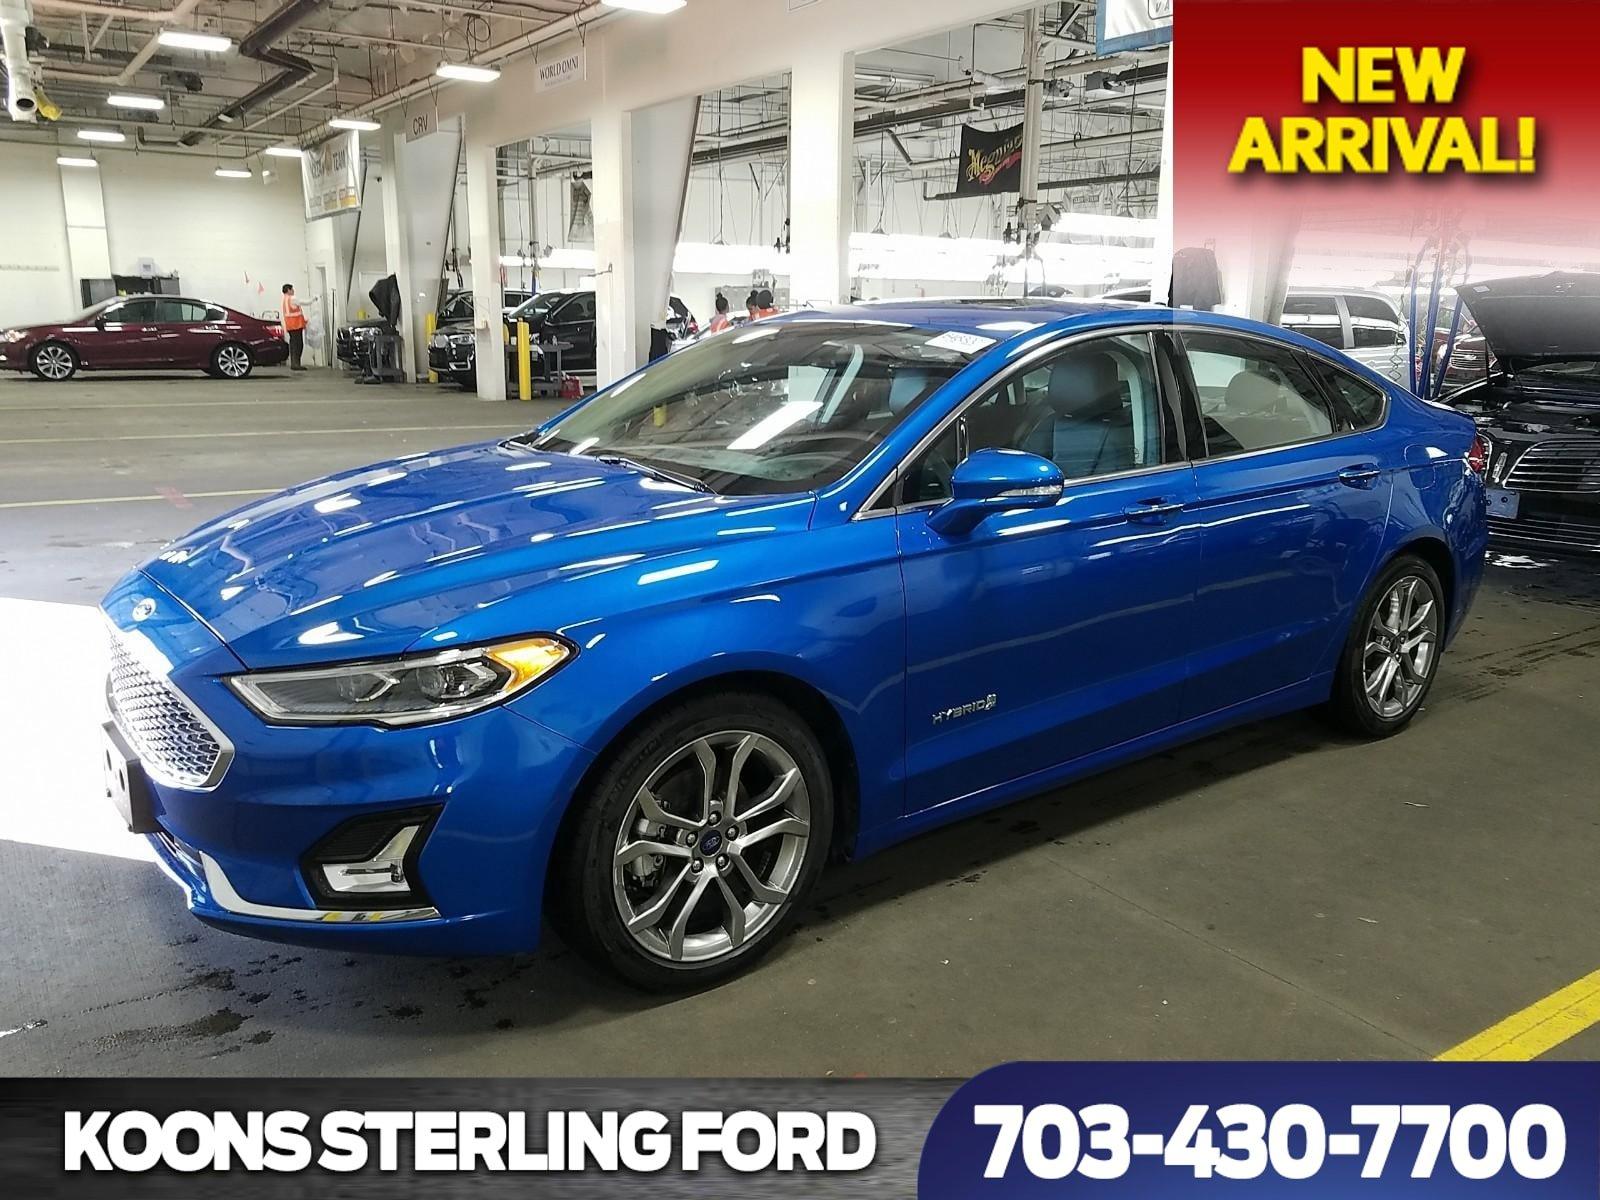 2019 Ford Fusion Titanium Hybrid image